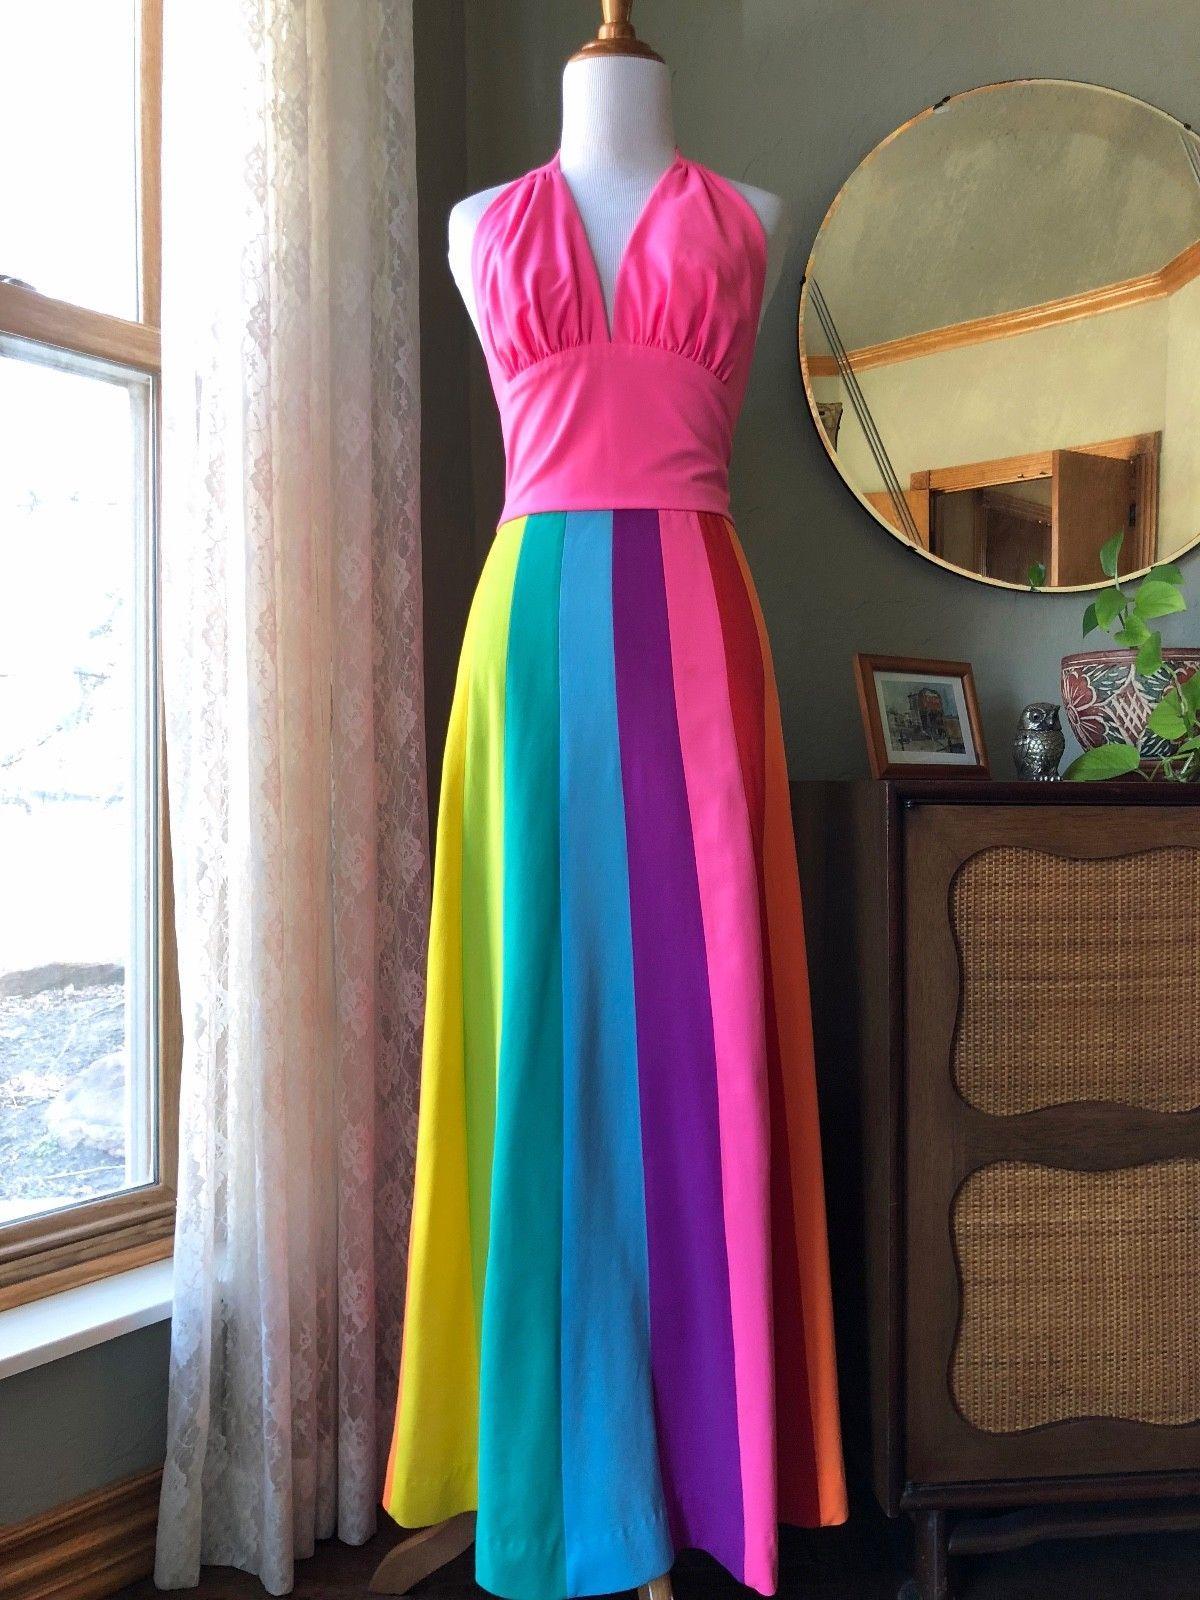 60s Deweese Design Dress Set 2 Piece Beach Halter Maxi Skirt Rainbow 70s Vintage Ebay Set Dress Designer Dresses Dresses [ 1600 x 1200 Pixel ]